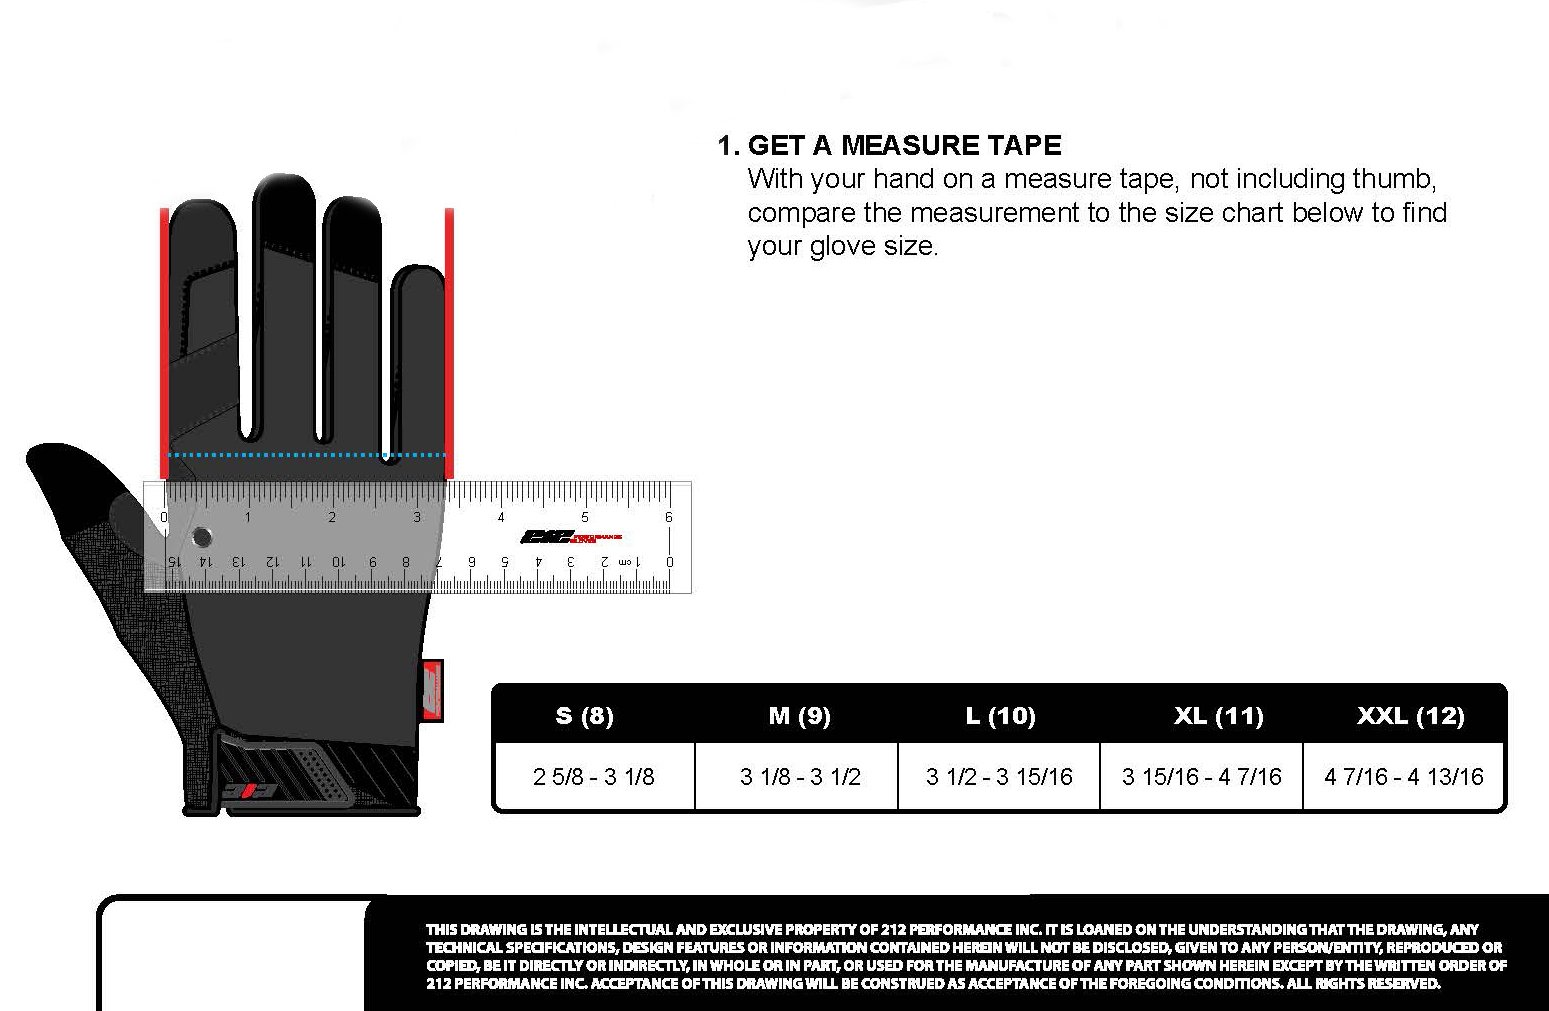 212 Performance Gloves IMP-88-009 Super Hi-Vis Impact Gloves, Medium by 212 Performance Gloves (Image #7)